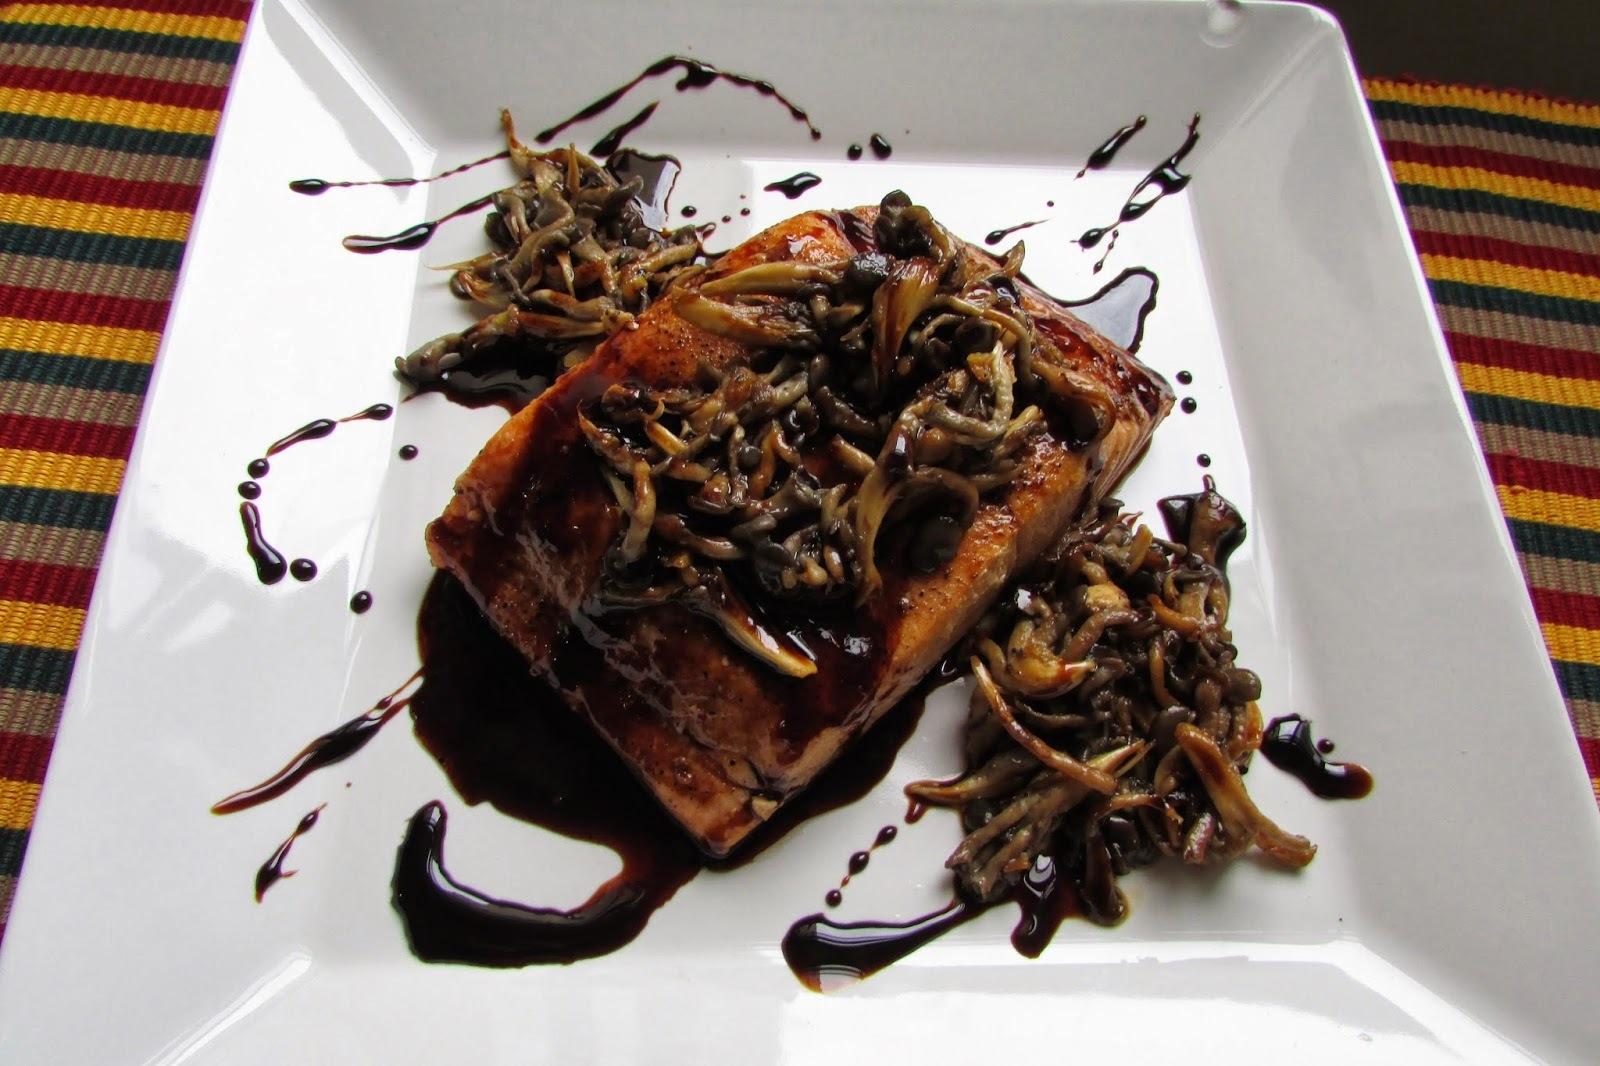 de file de peixe ao molho feito na panela que grelha